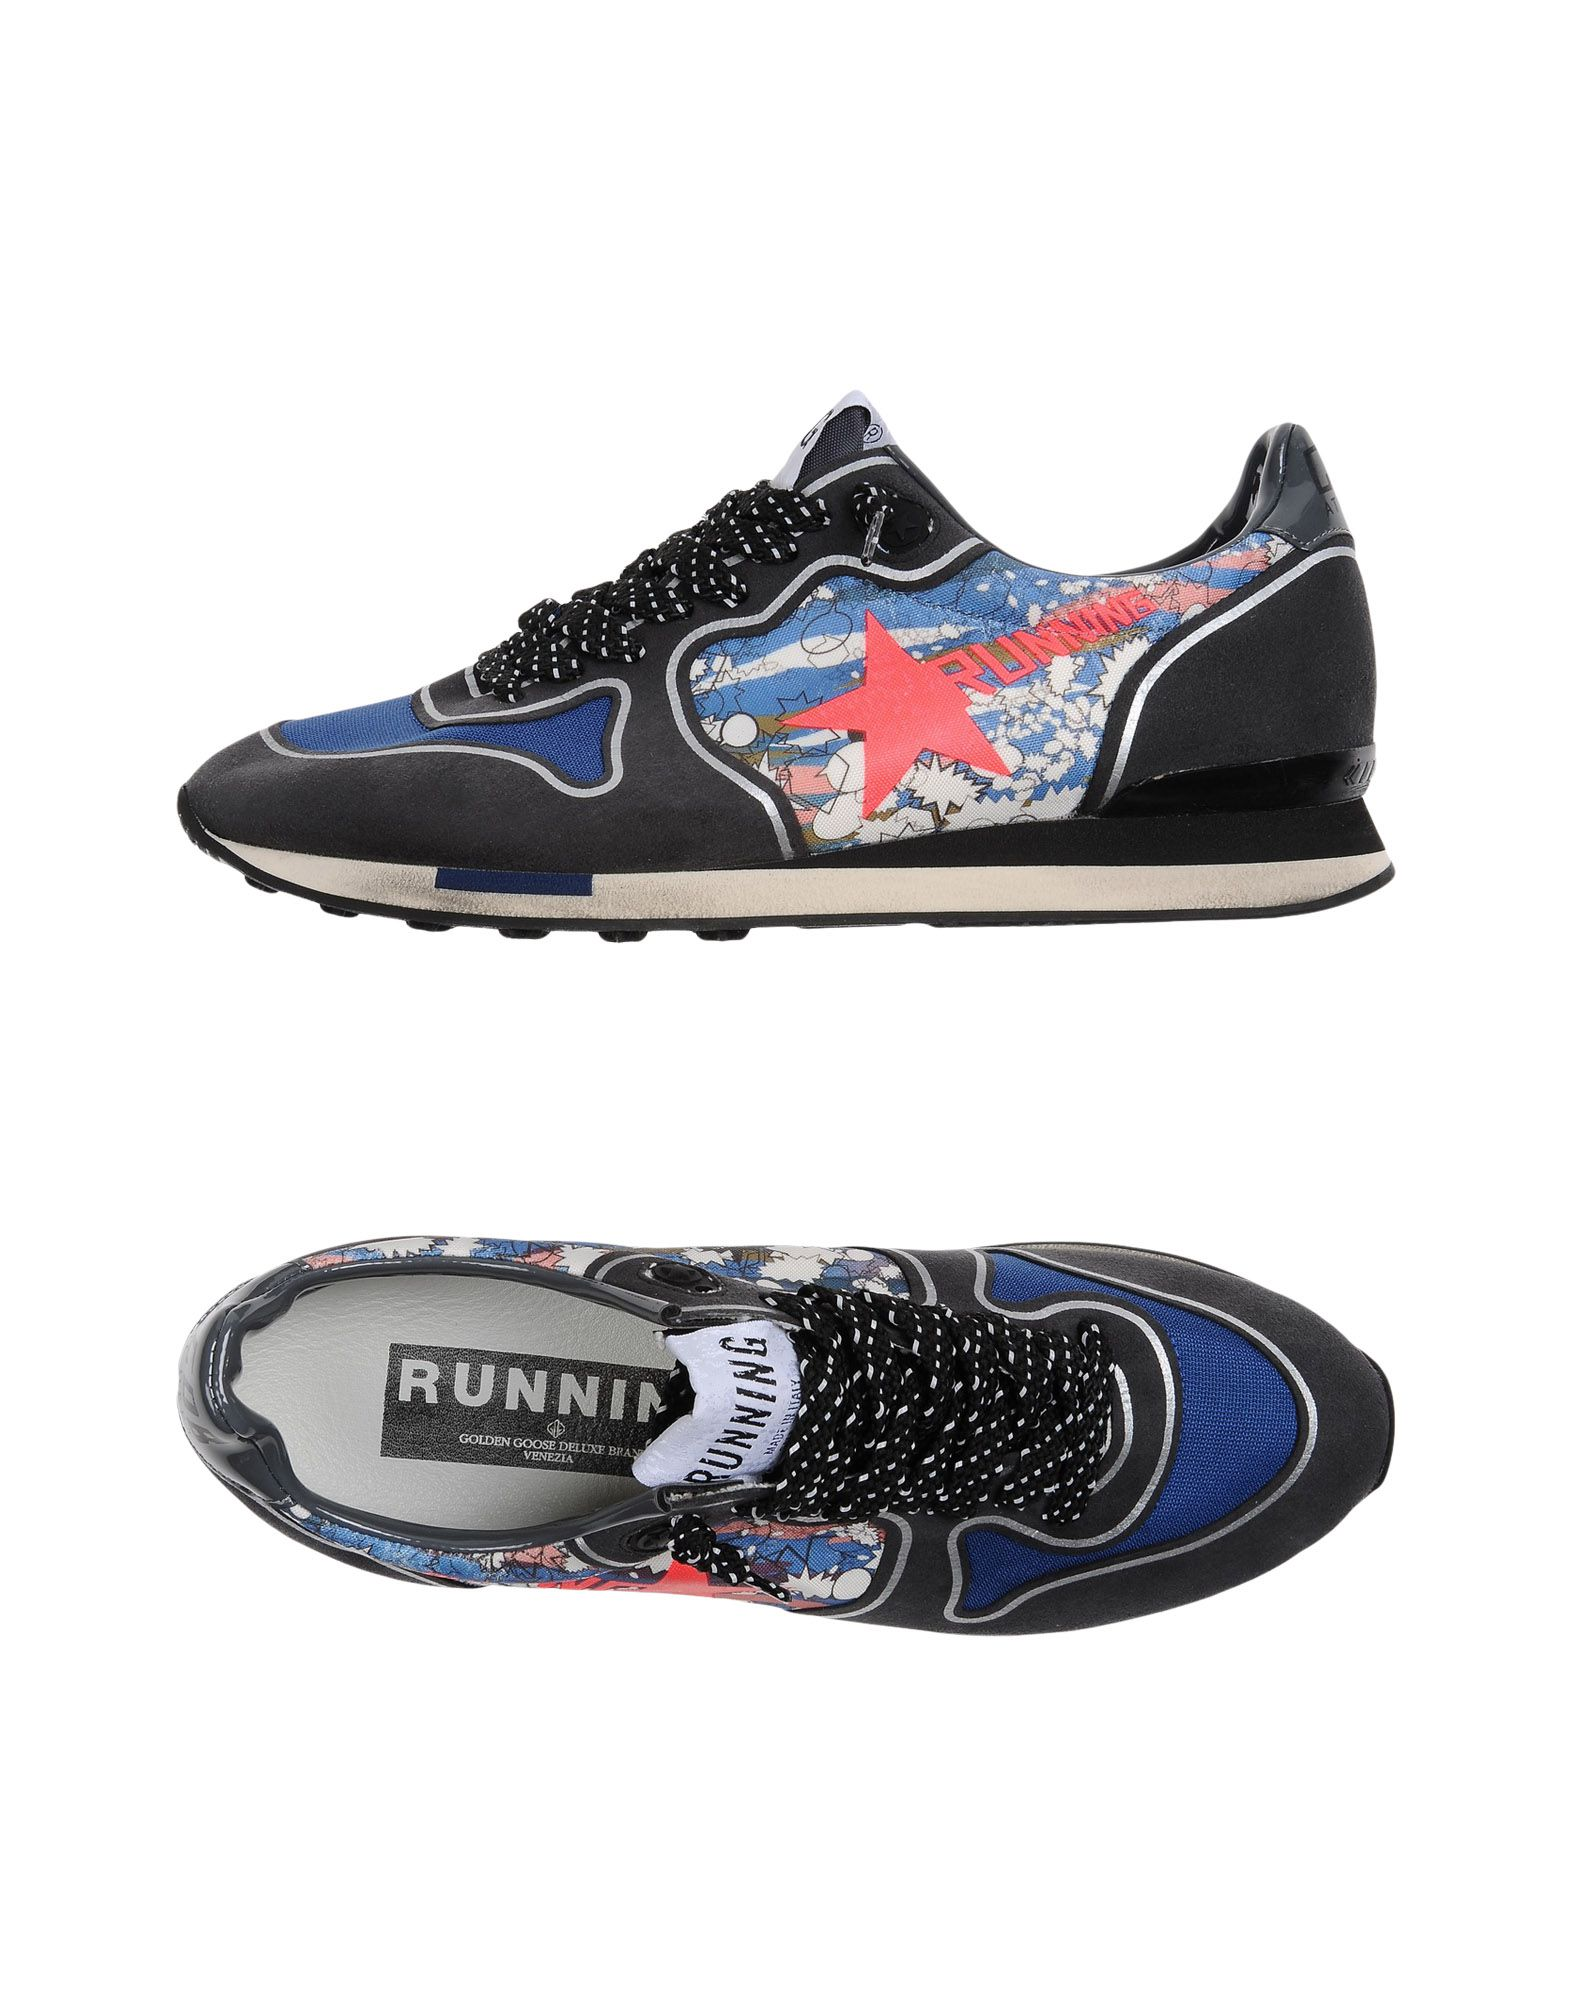 Golden Goose Deluxe Brand Sneakers Damen  11044520BIGut aussehende strapazierfähige Schuhe